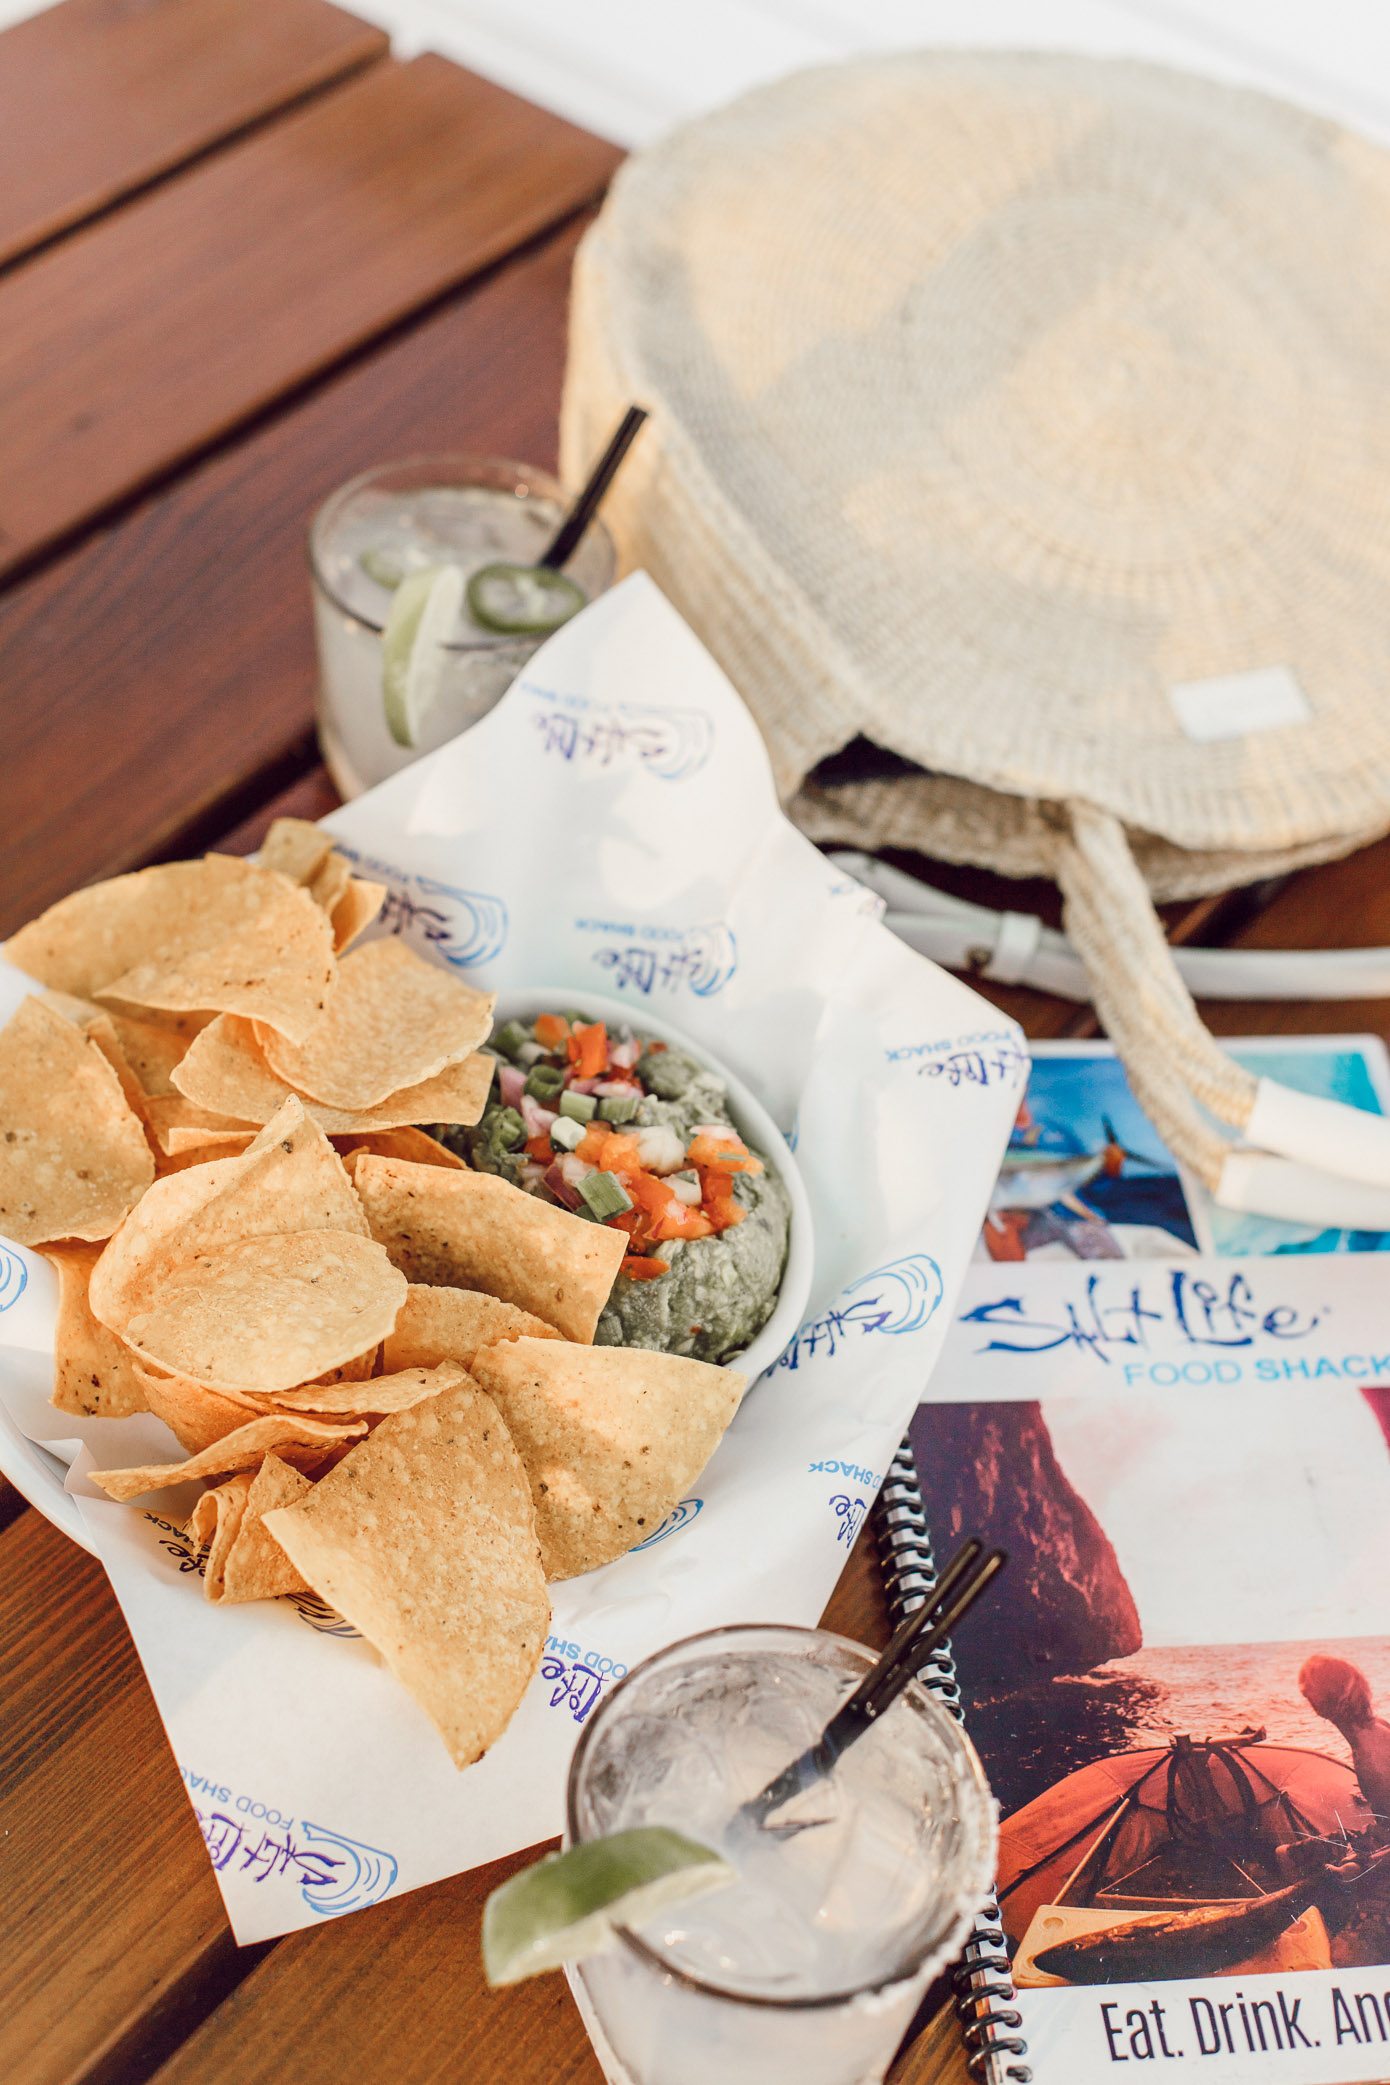 Where to eat in Amelia Island | Salt Life | Louella Reese